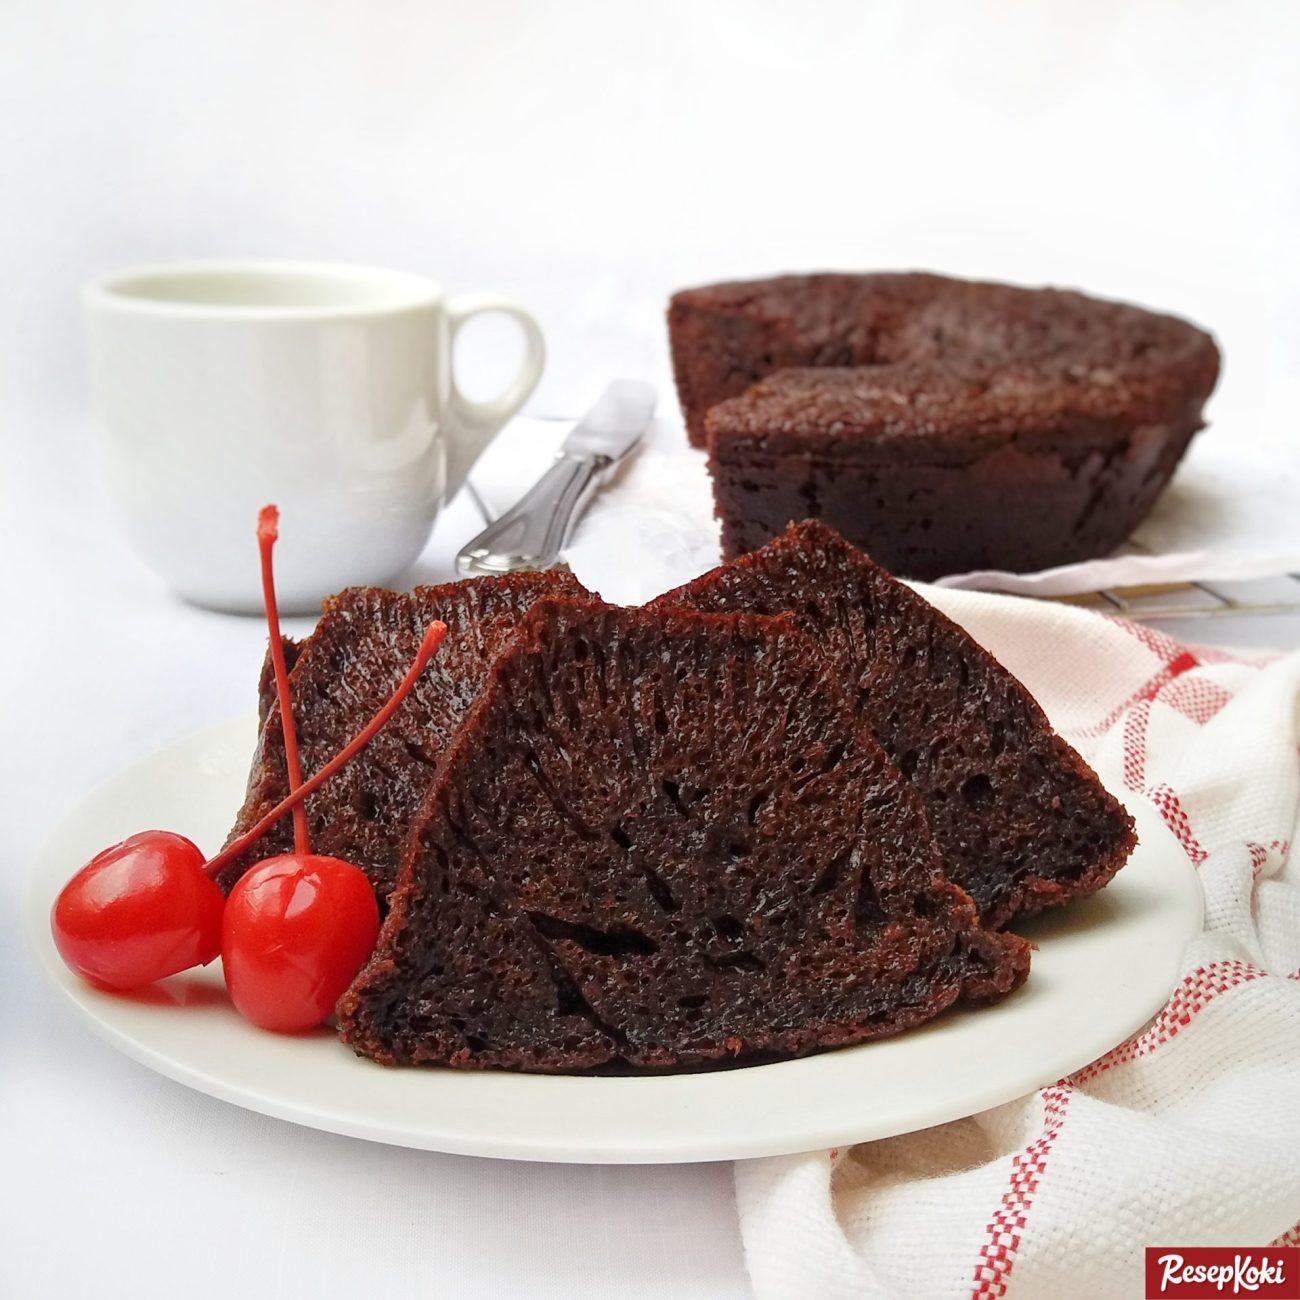 Resep Kue Bolu Sarang Semut (Caramel Cake)